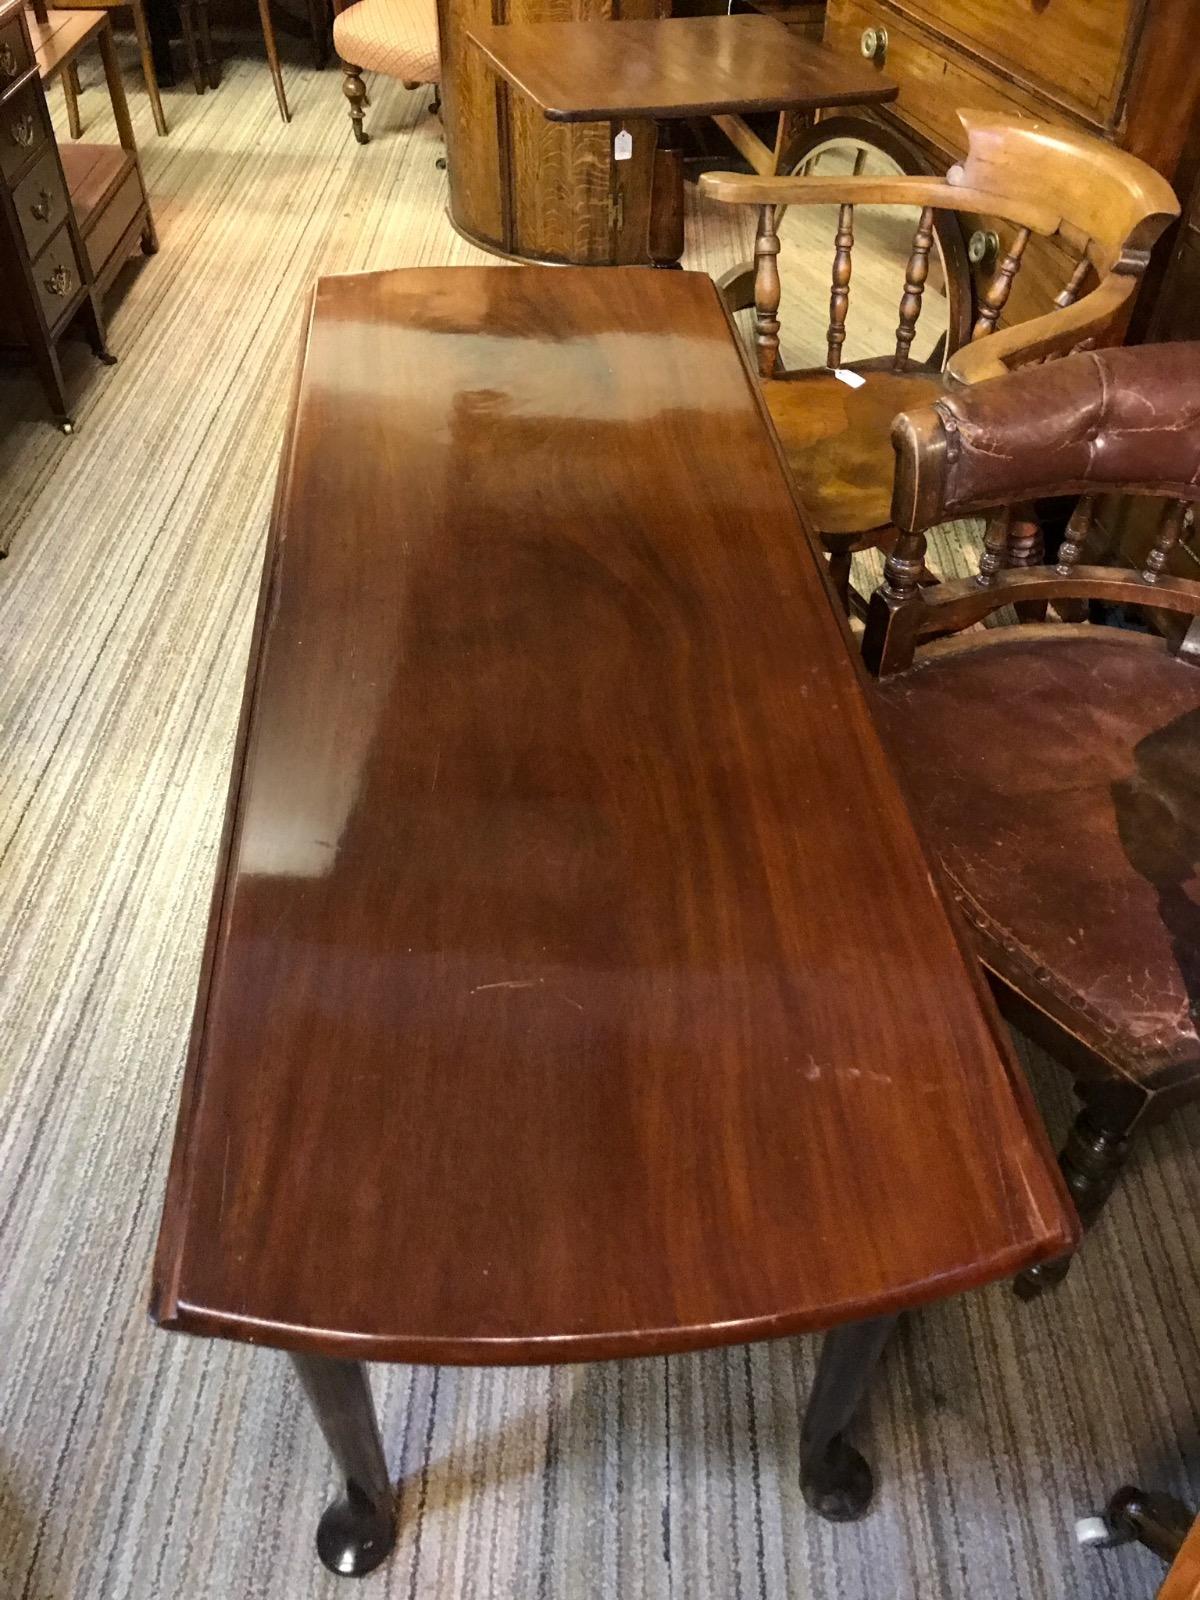 Georgian Large Drop-Leaf Dining Table (1 of 1)